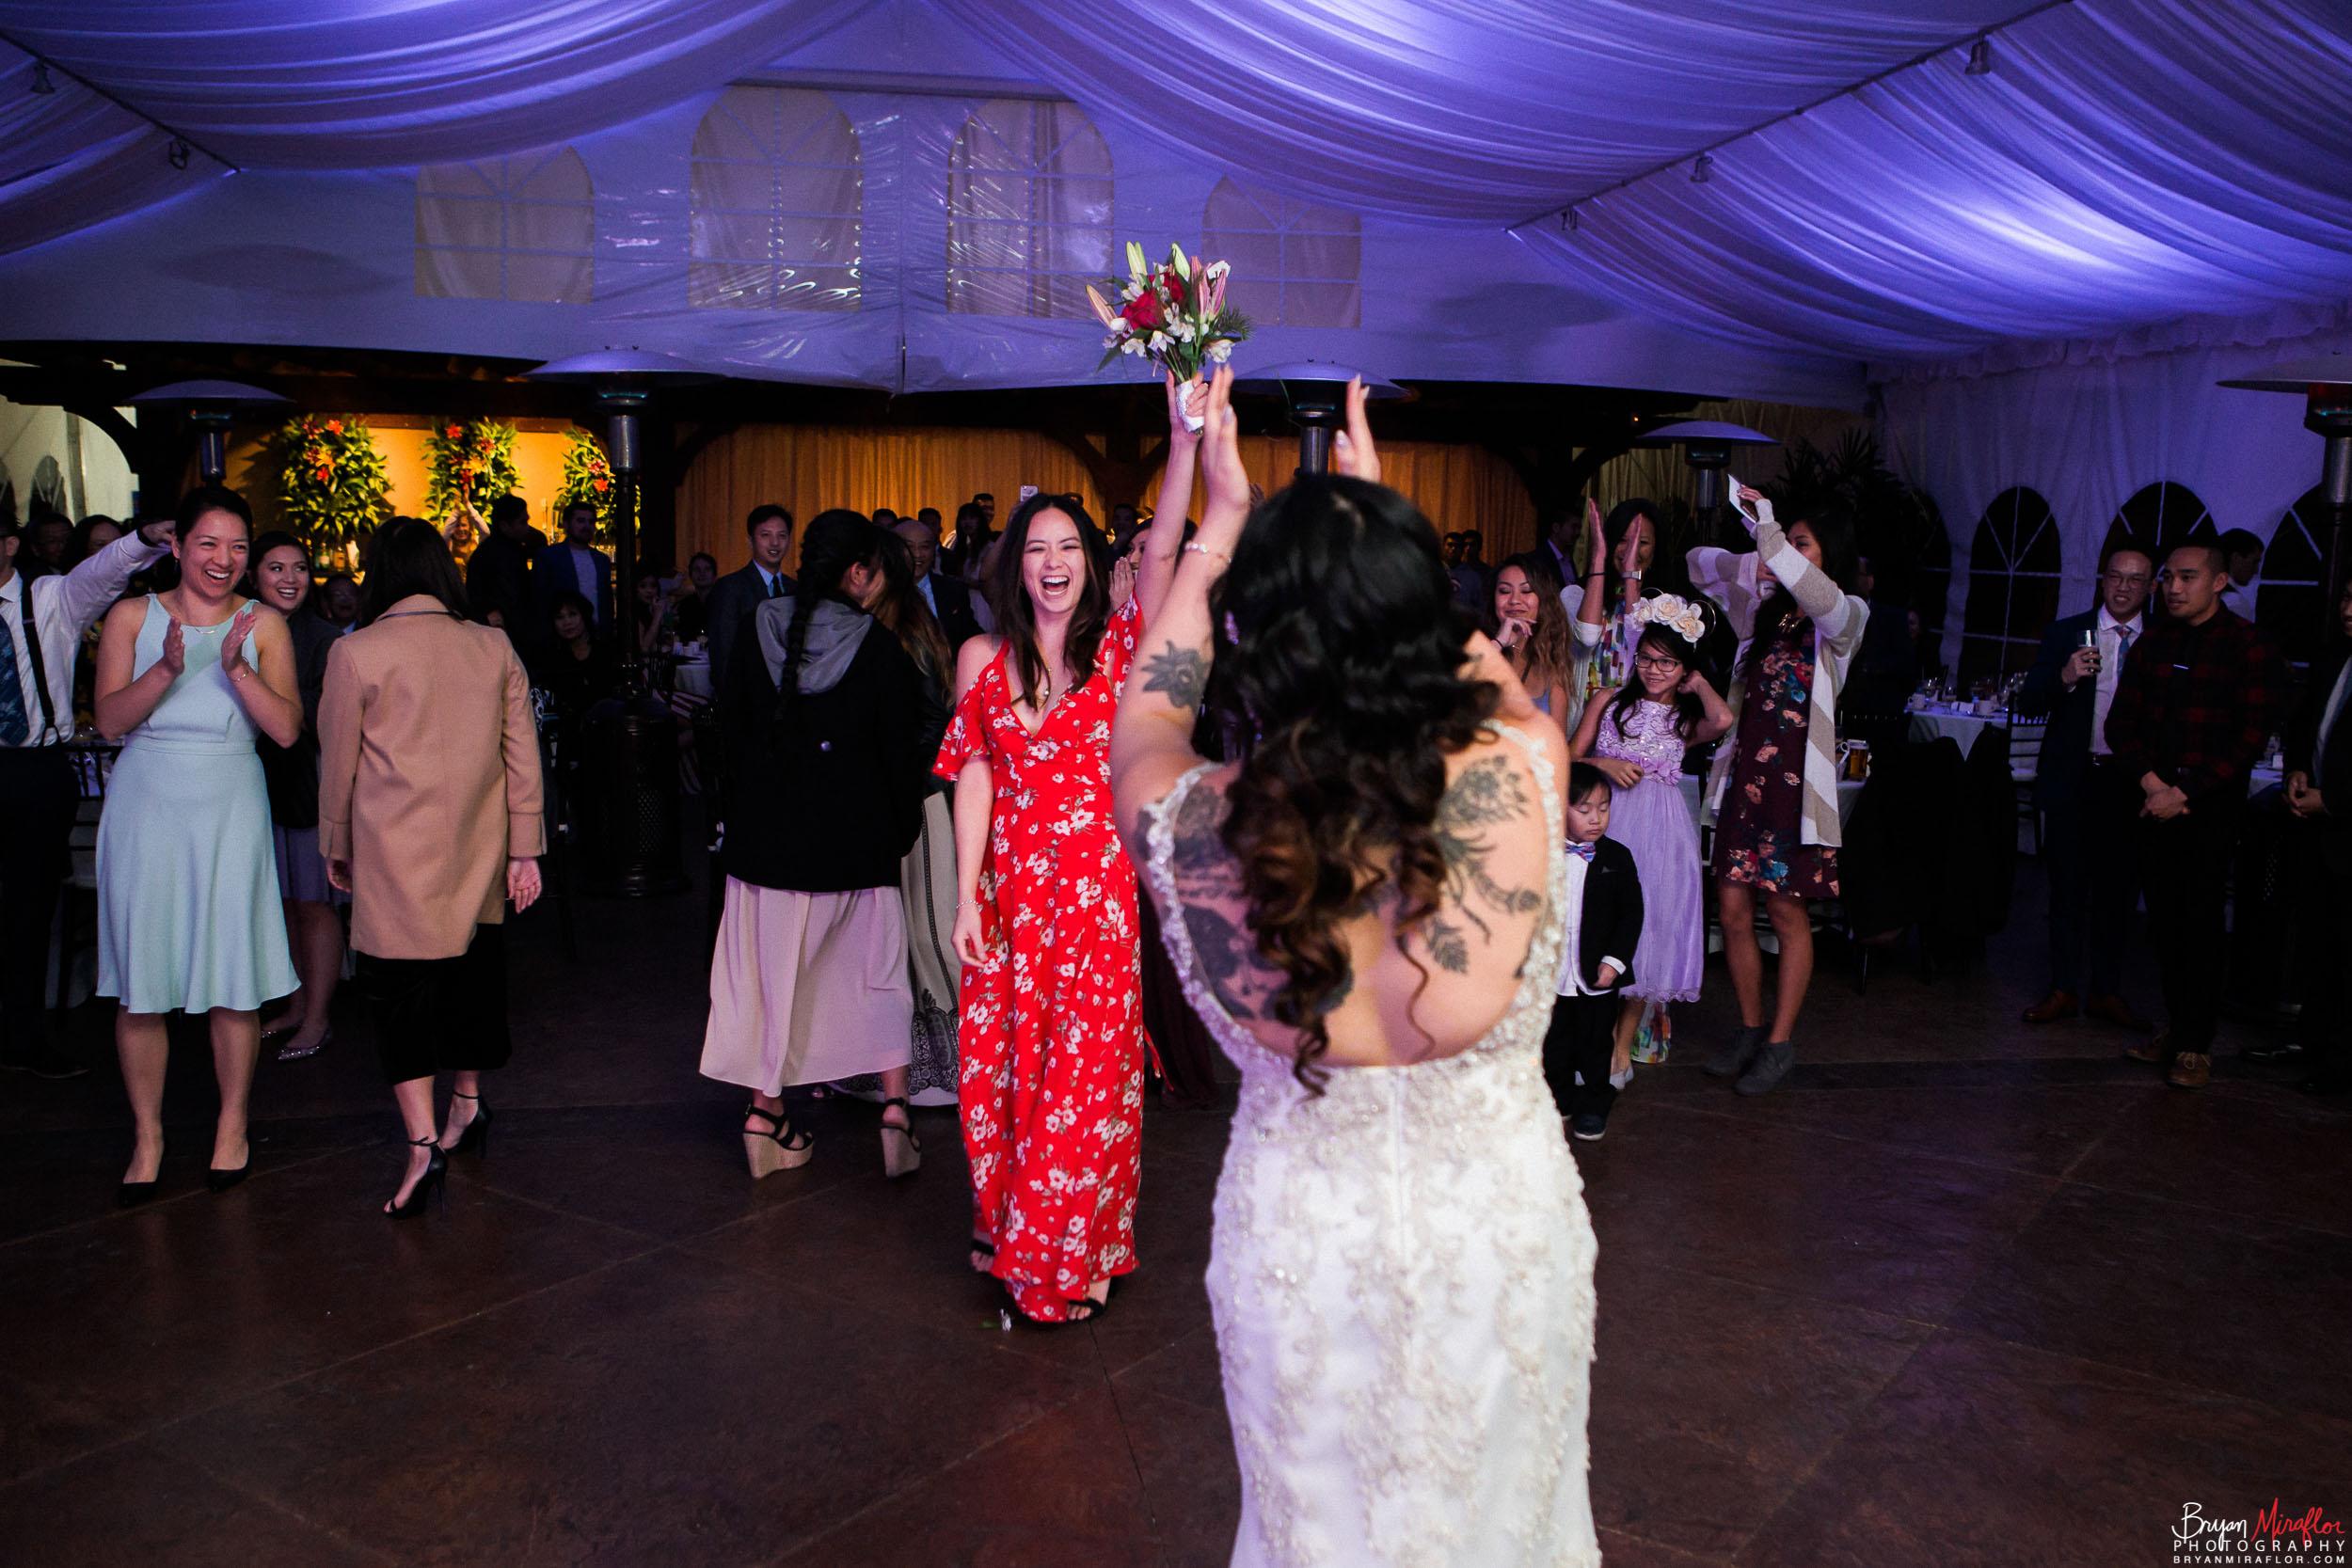 Bryan-Miraflor-Photography-Hannah-Jonathan-Married-Grand-Traditions-Estate-Gardens-Fallbrook-20171222-208.jpg